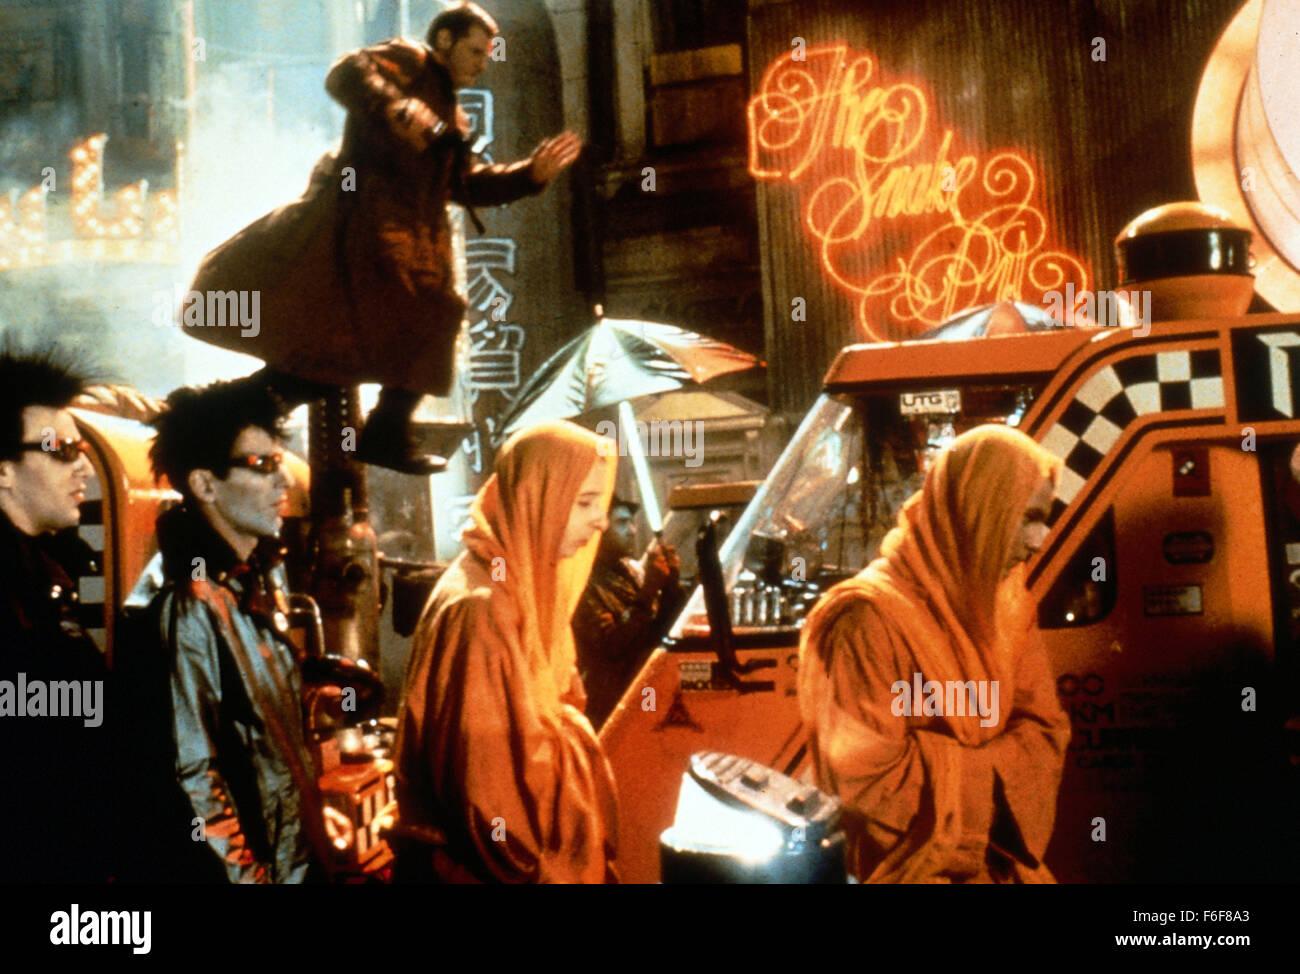 Film Title:  BLADE RUNNER. DIRECTOR:  Ridley Scott.  STUDIO:  WARNER BROS.  PLOT:    In a cyberpunk vision of the - Stock Image